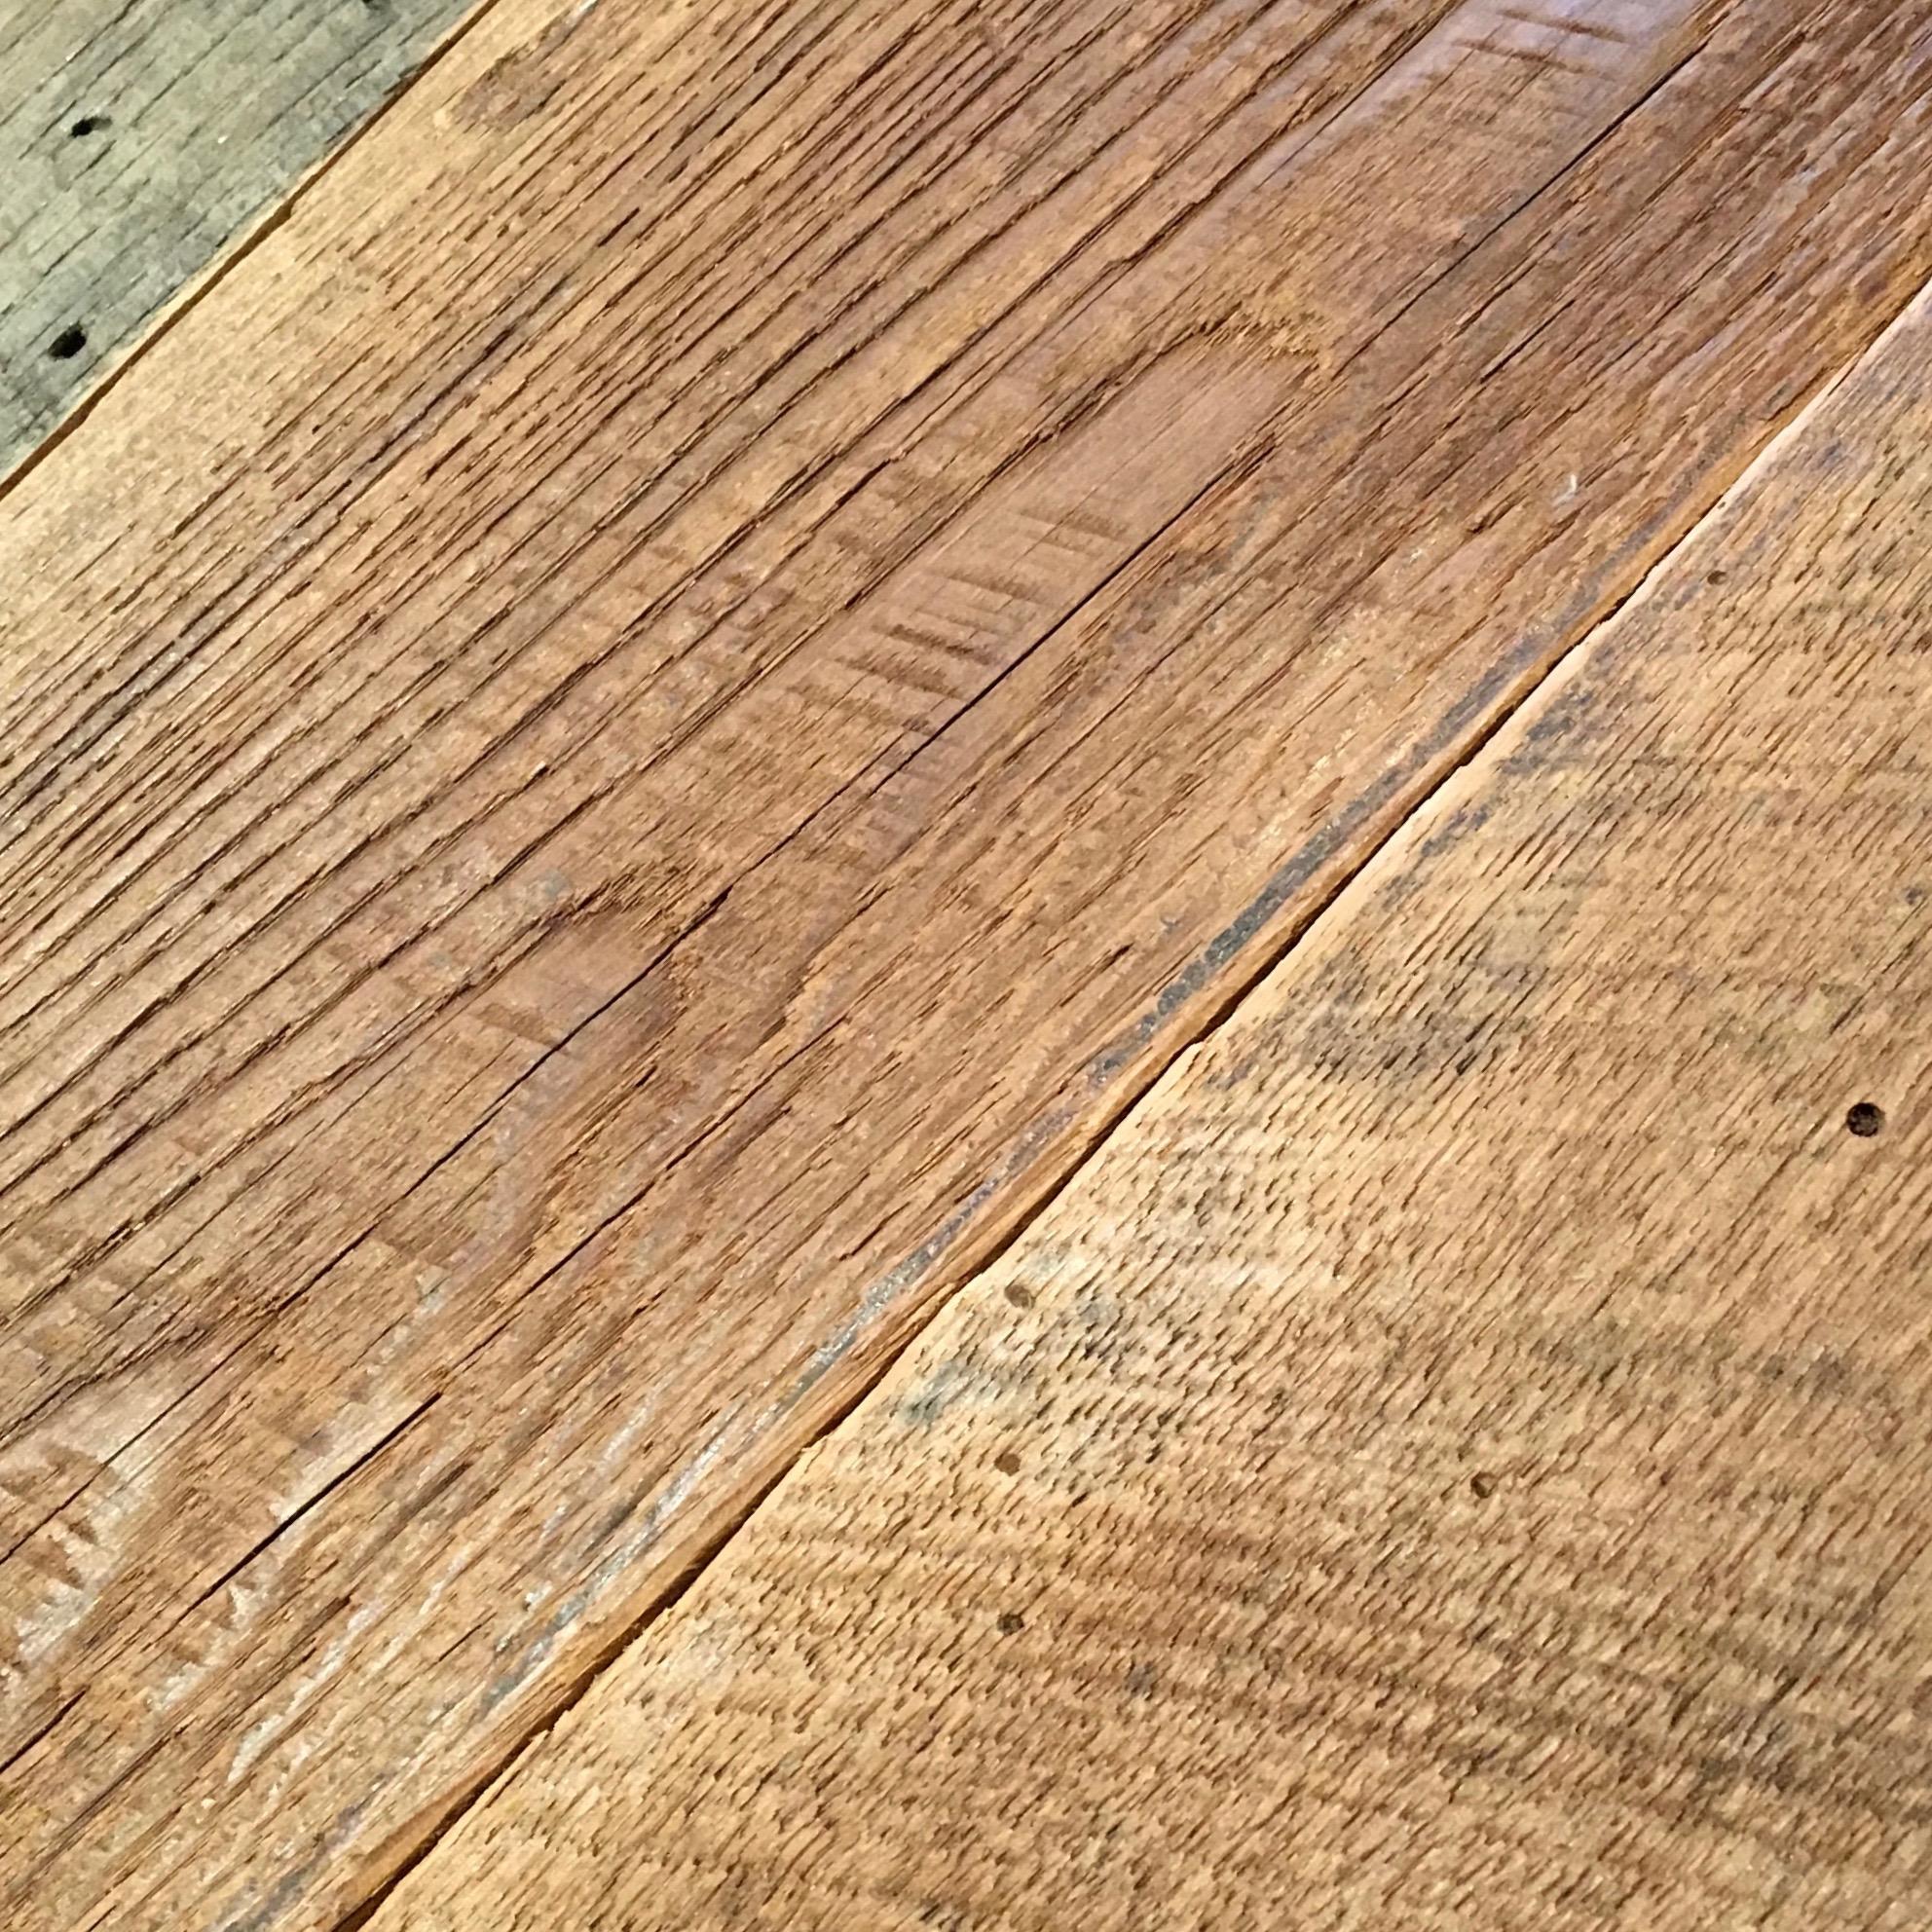 sanded chestnut planking - Reclaimed Planking Wormy Chestnut